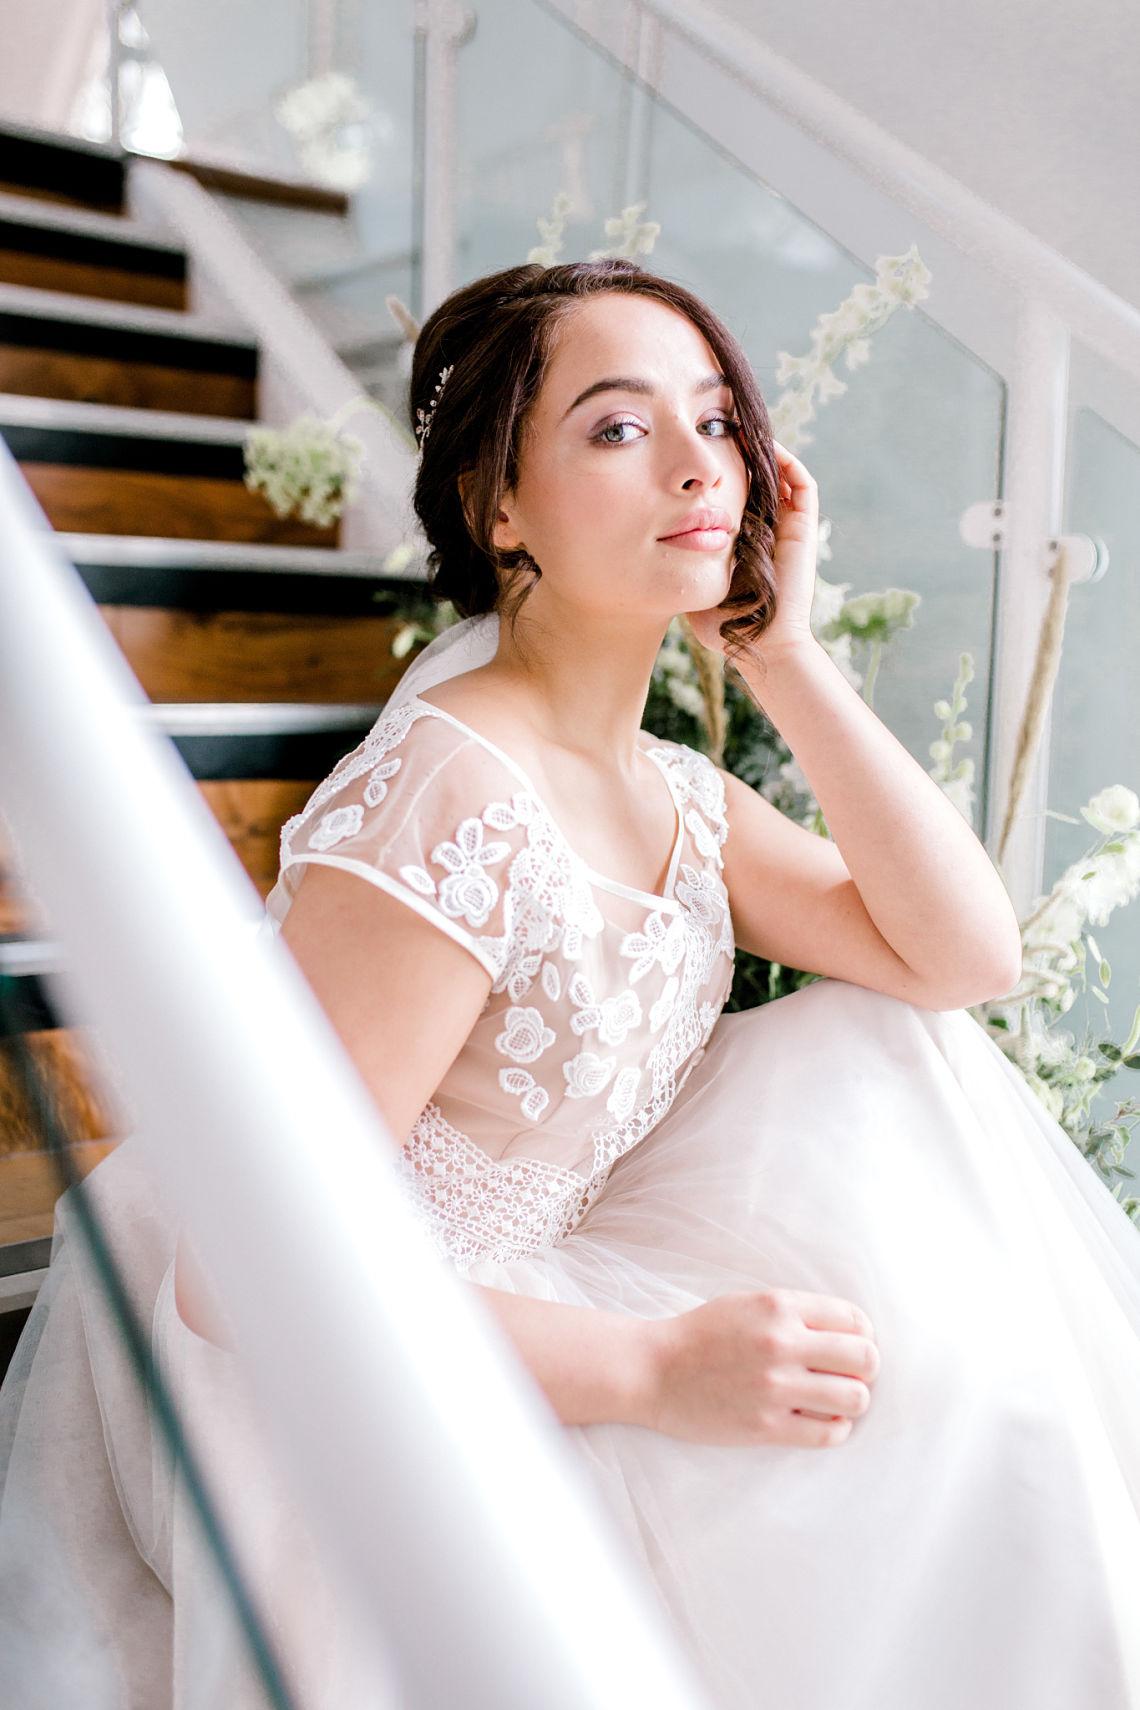 bride-bridal shots-essex wedding planner-old parish rooms